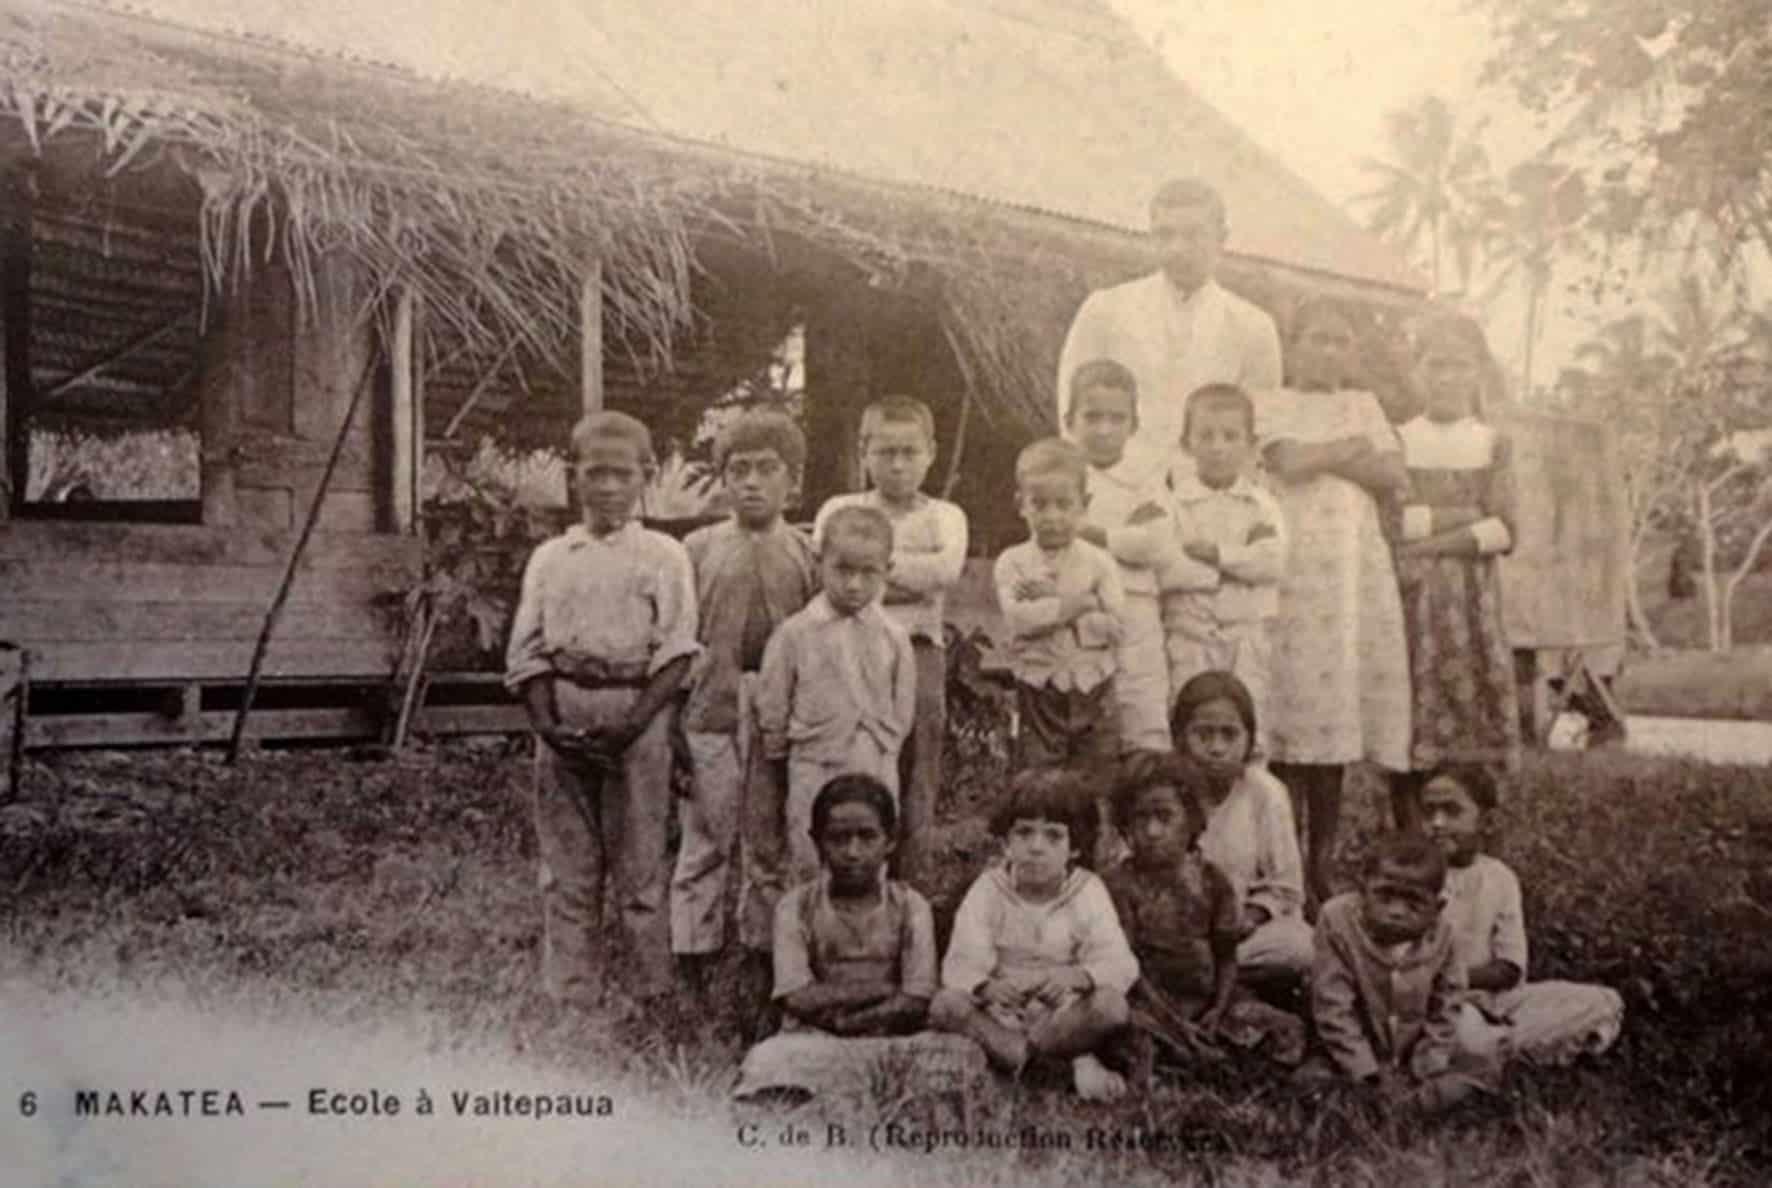 Ecole de Vaitepaua à Makatea vers 1925